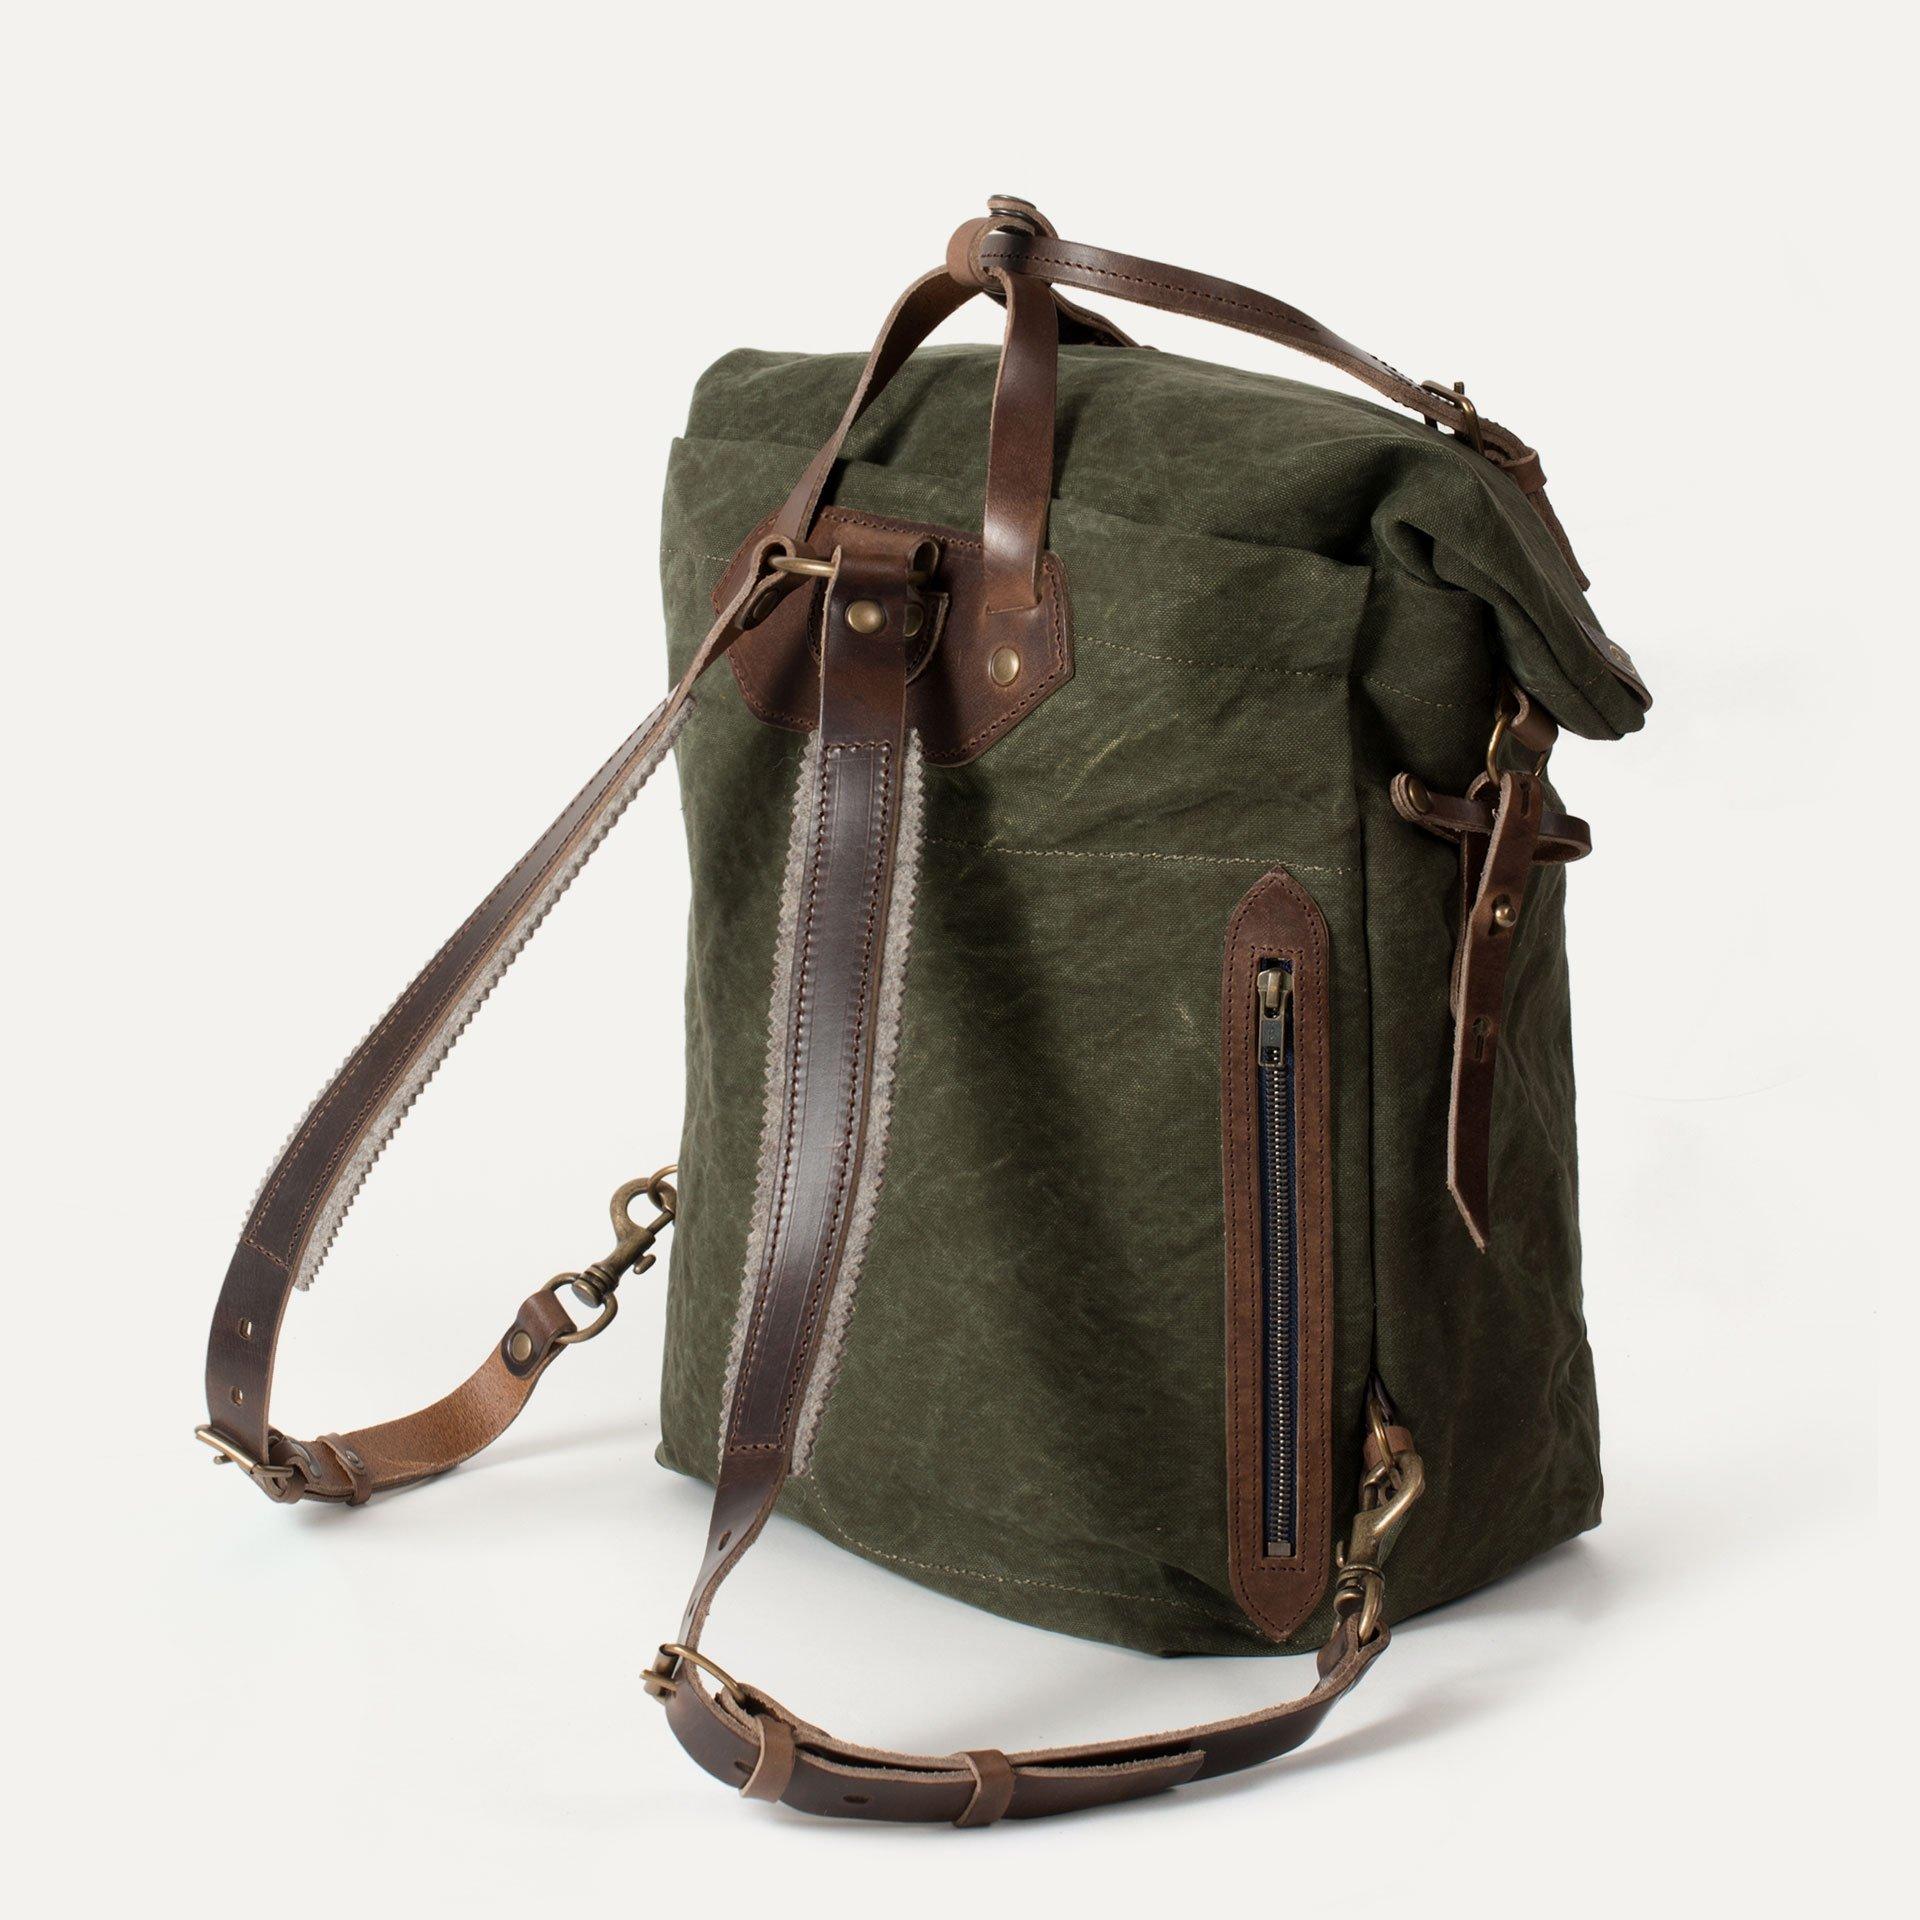 Woody M Backpack - Dark Khaki (image n°3)